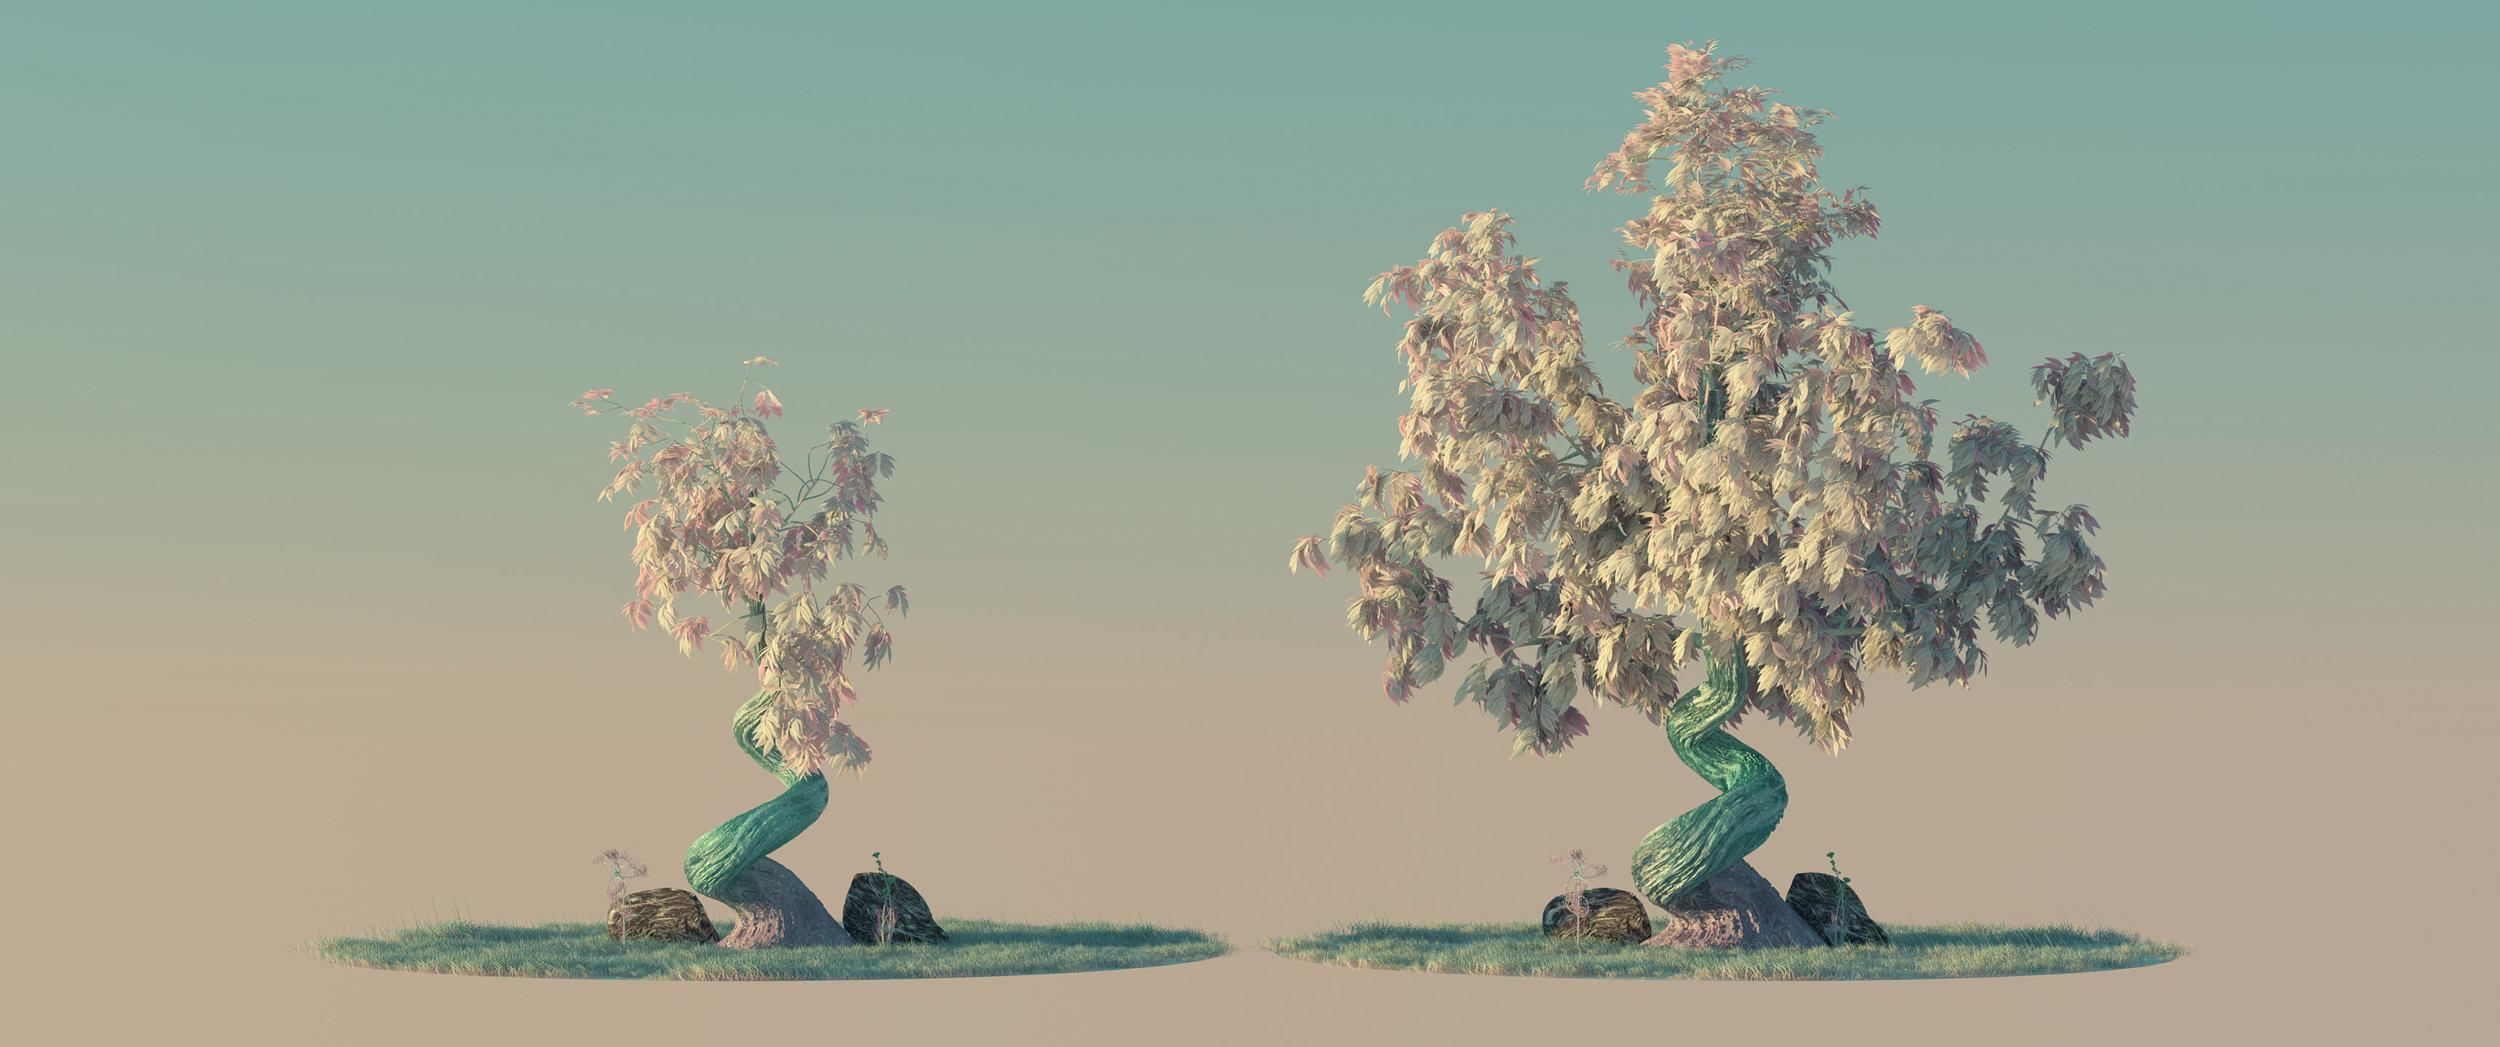 trees_3.jpg